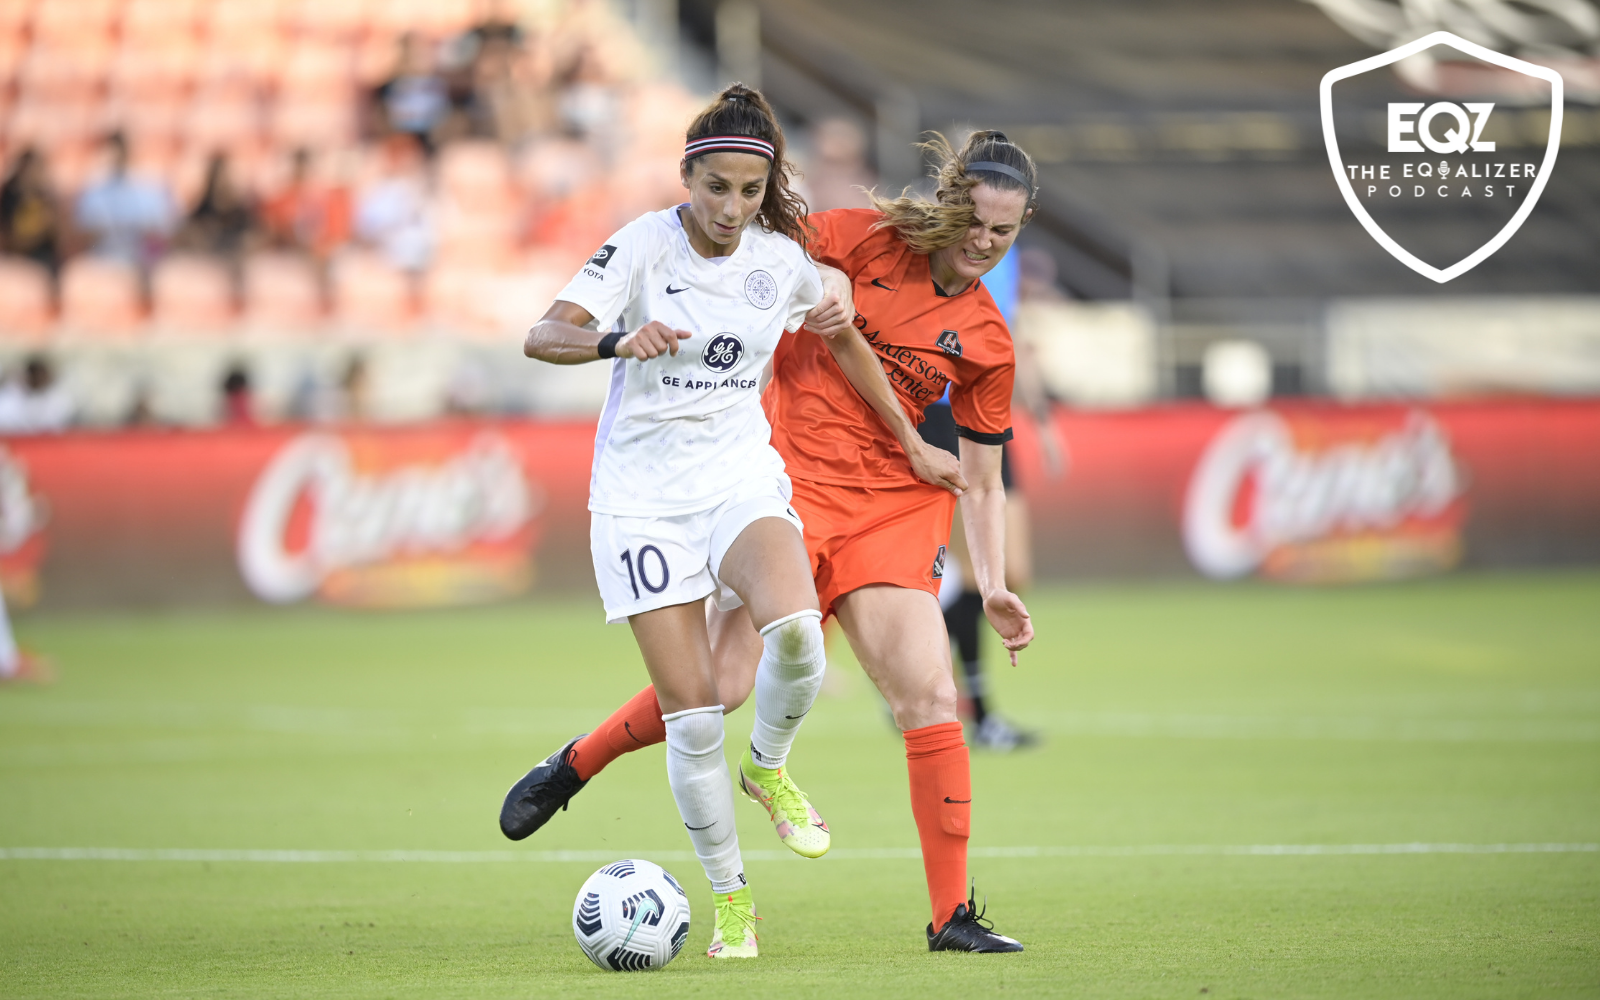 Racing Louisville FC forward Nadia Nadim dribbles the ball while Houston Dash player Katie Naughton defends.